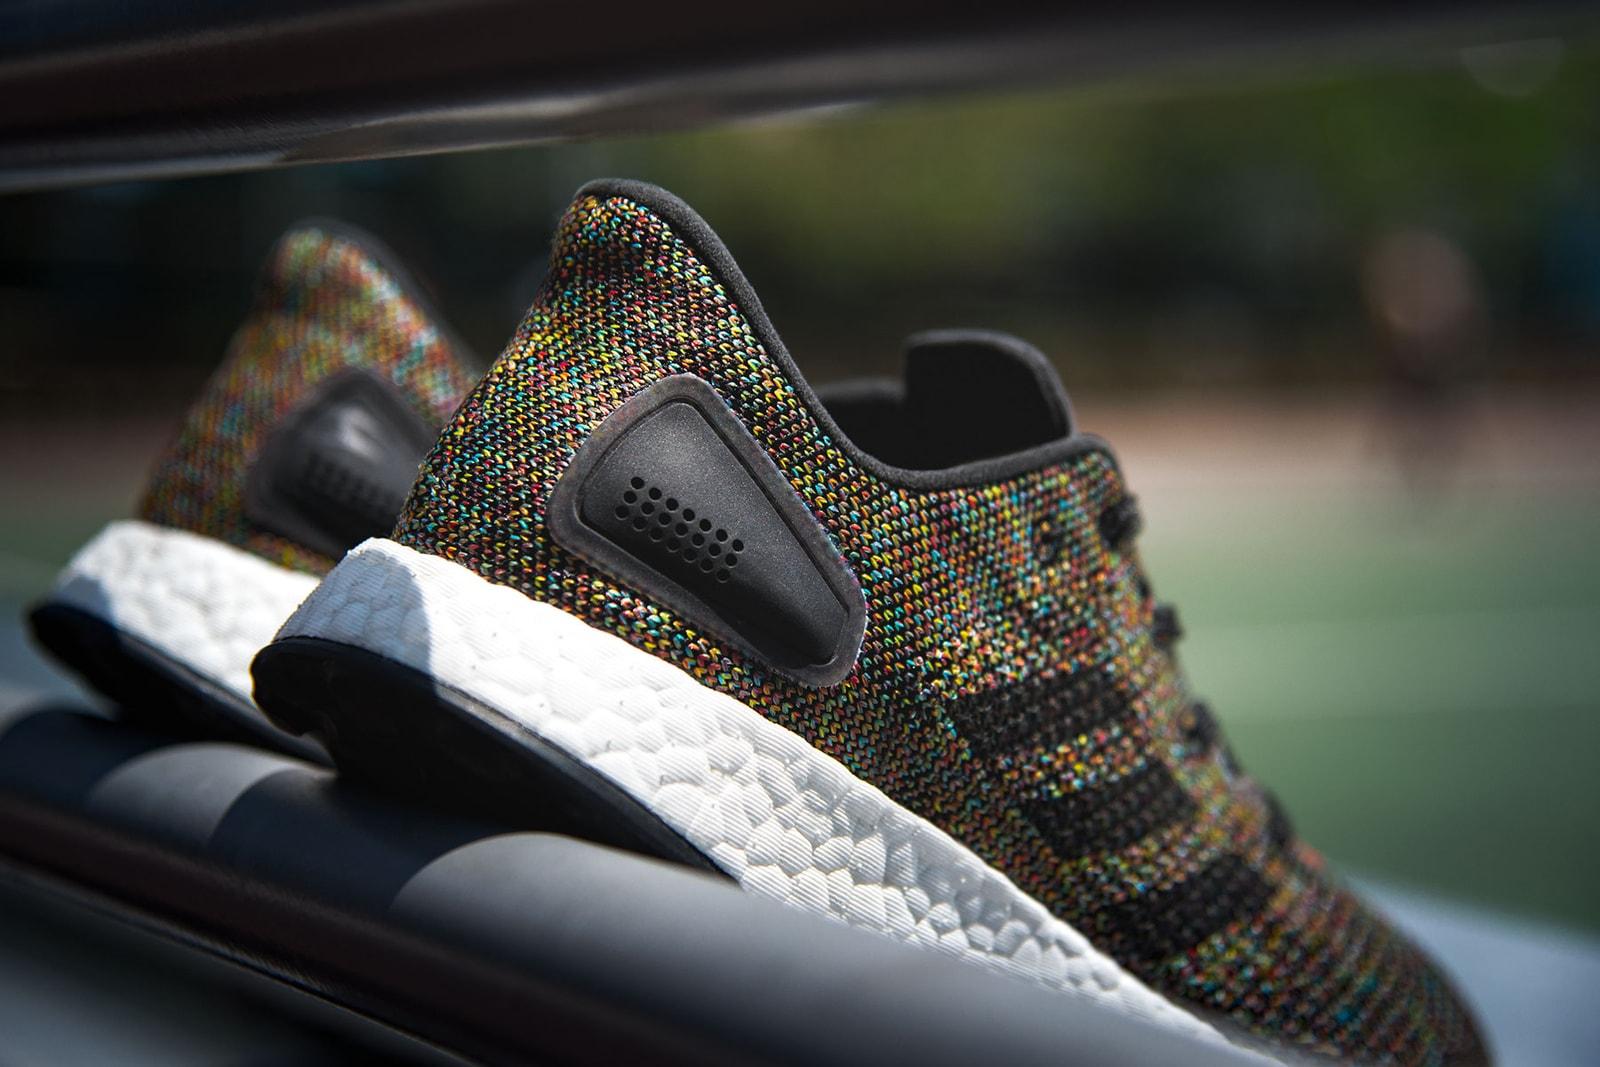 adidas PureBOOST DPR Exclusive Launch Party Running Stephan Schneider Berlin